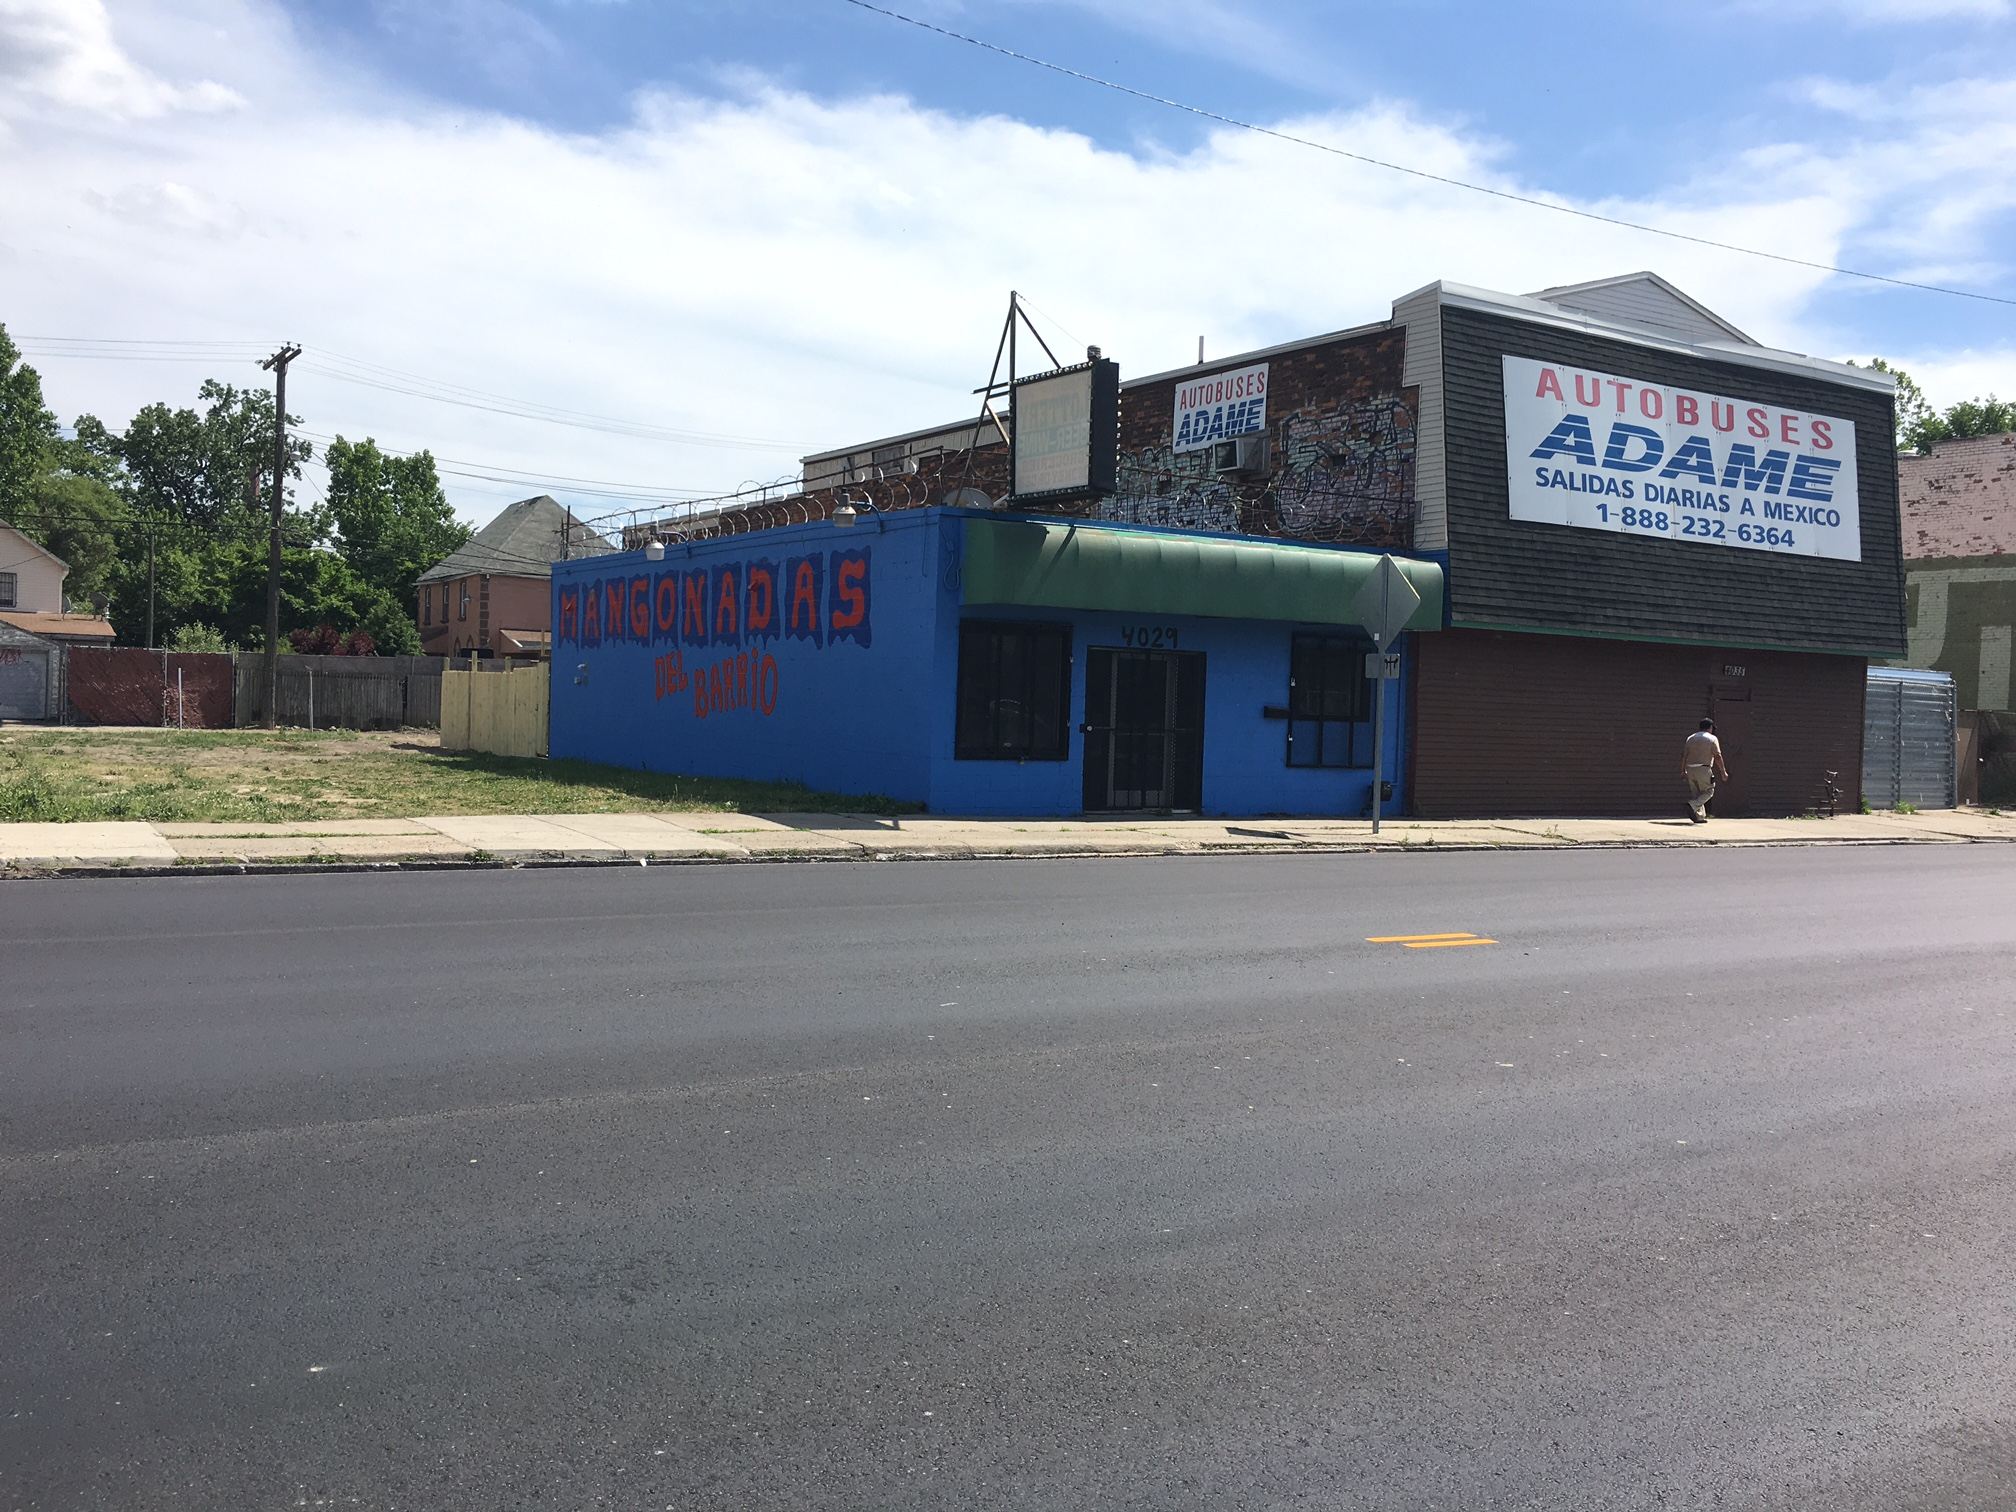 Mangonadas Del Barrio's second location is located on Vernor Highway in Mexicantown.